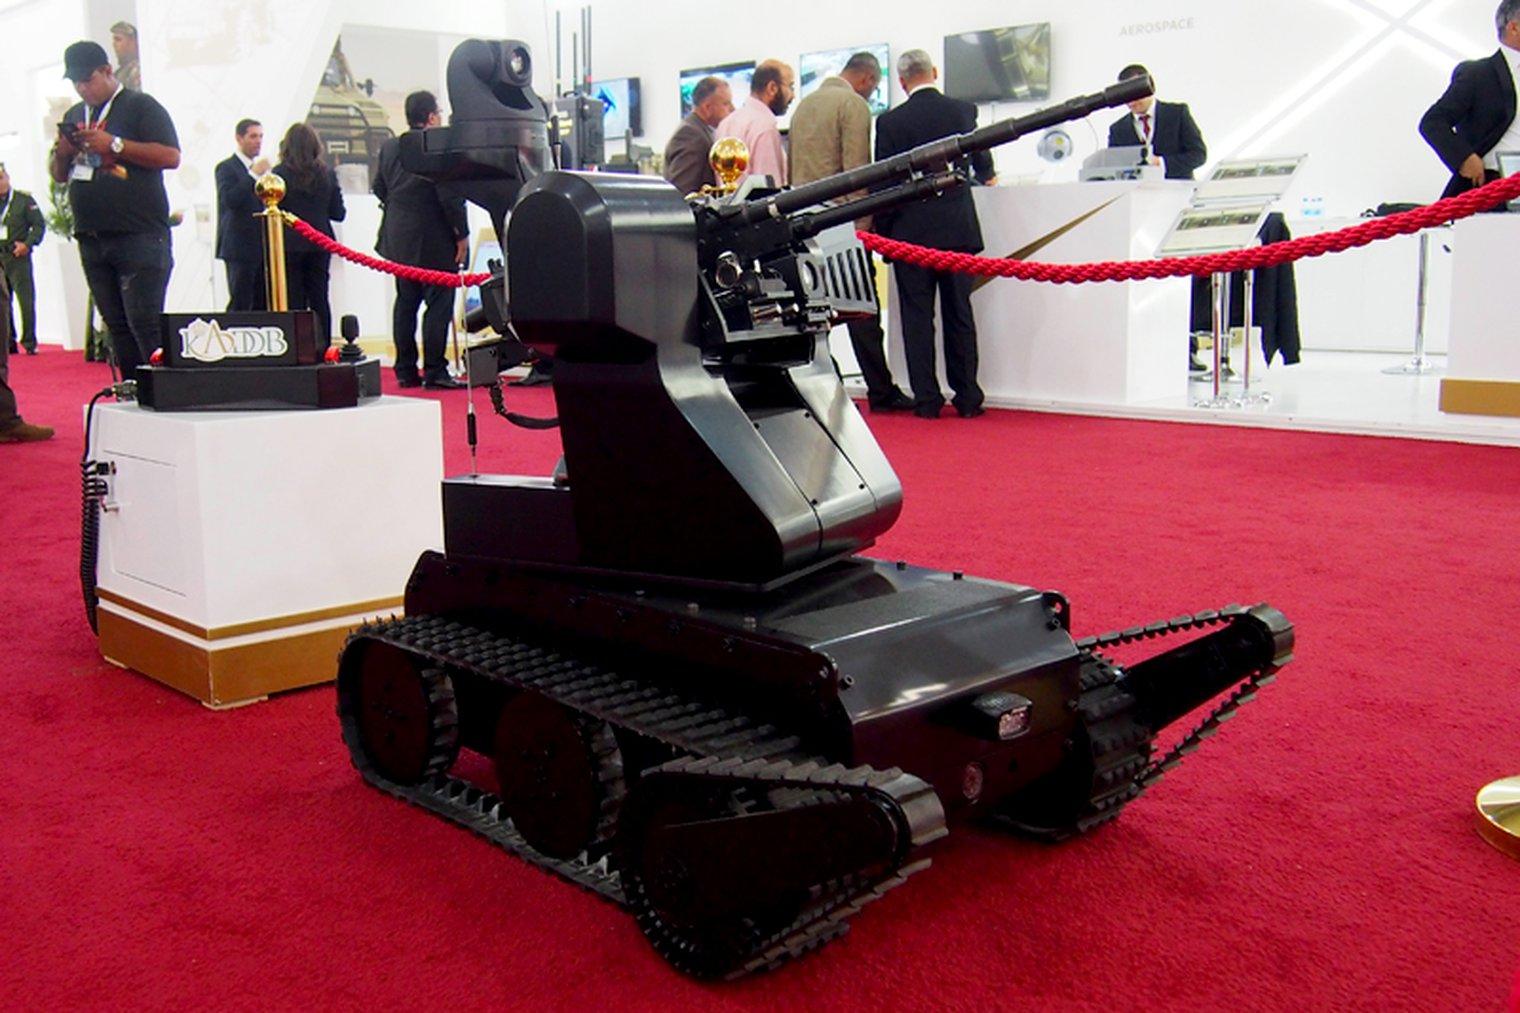 SOFEX 2018: Machine gun robot first public sighting ile ilgili görsel sonucu